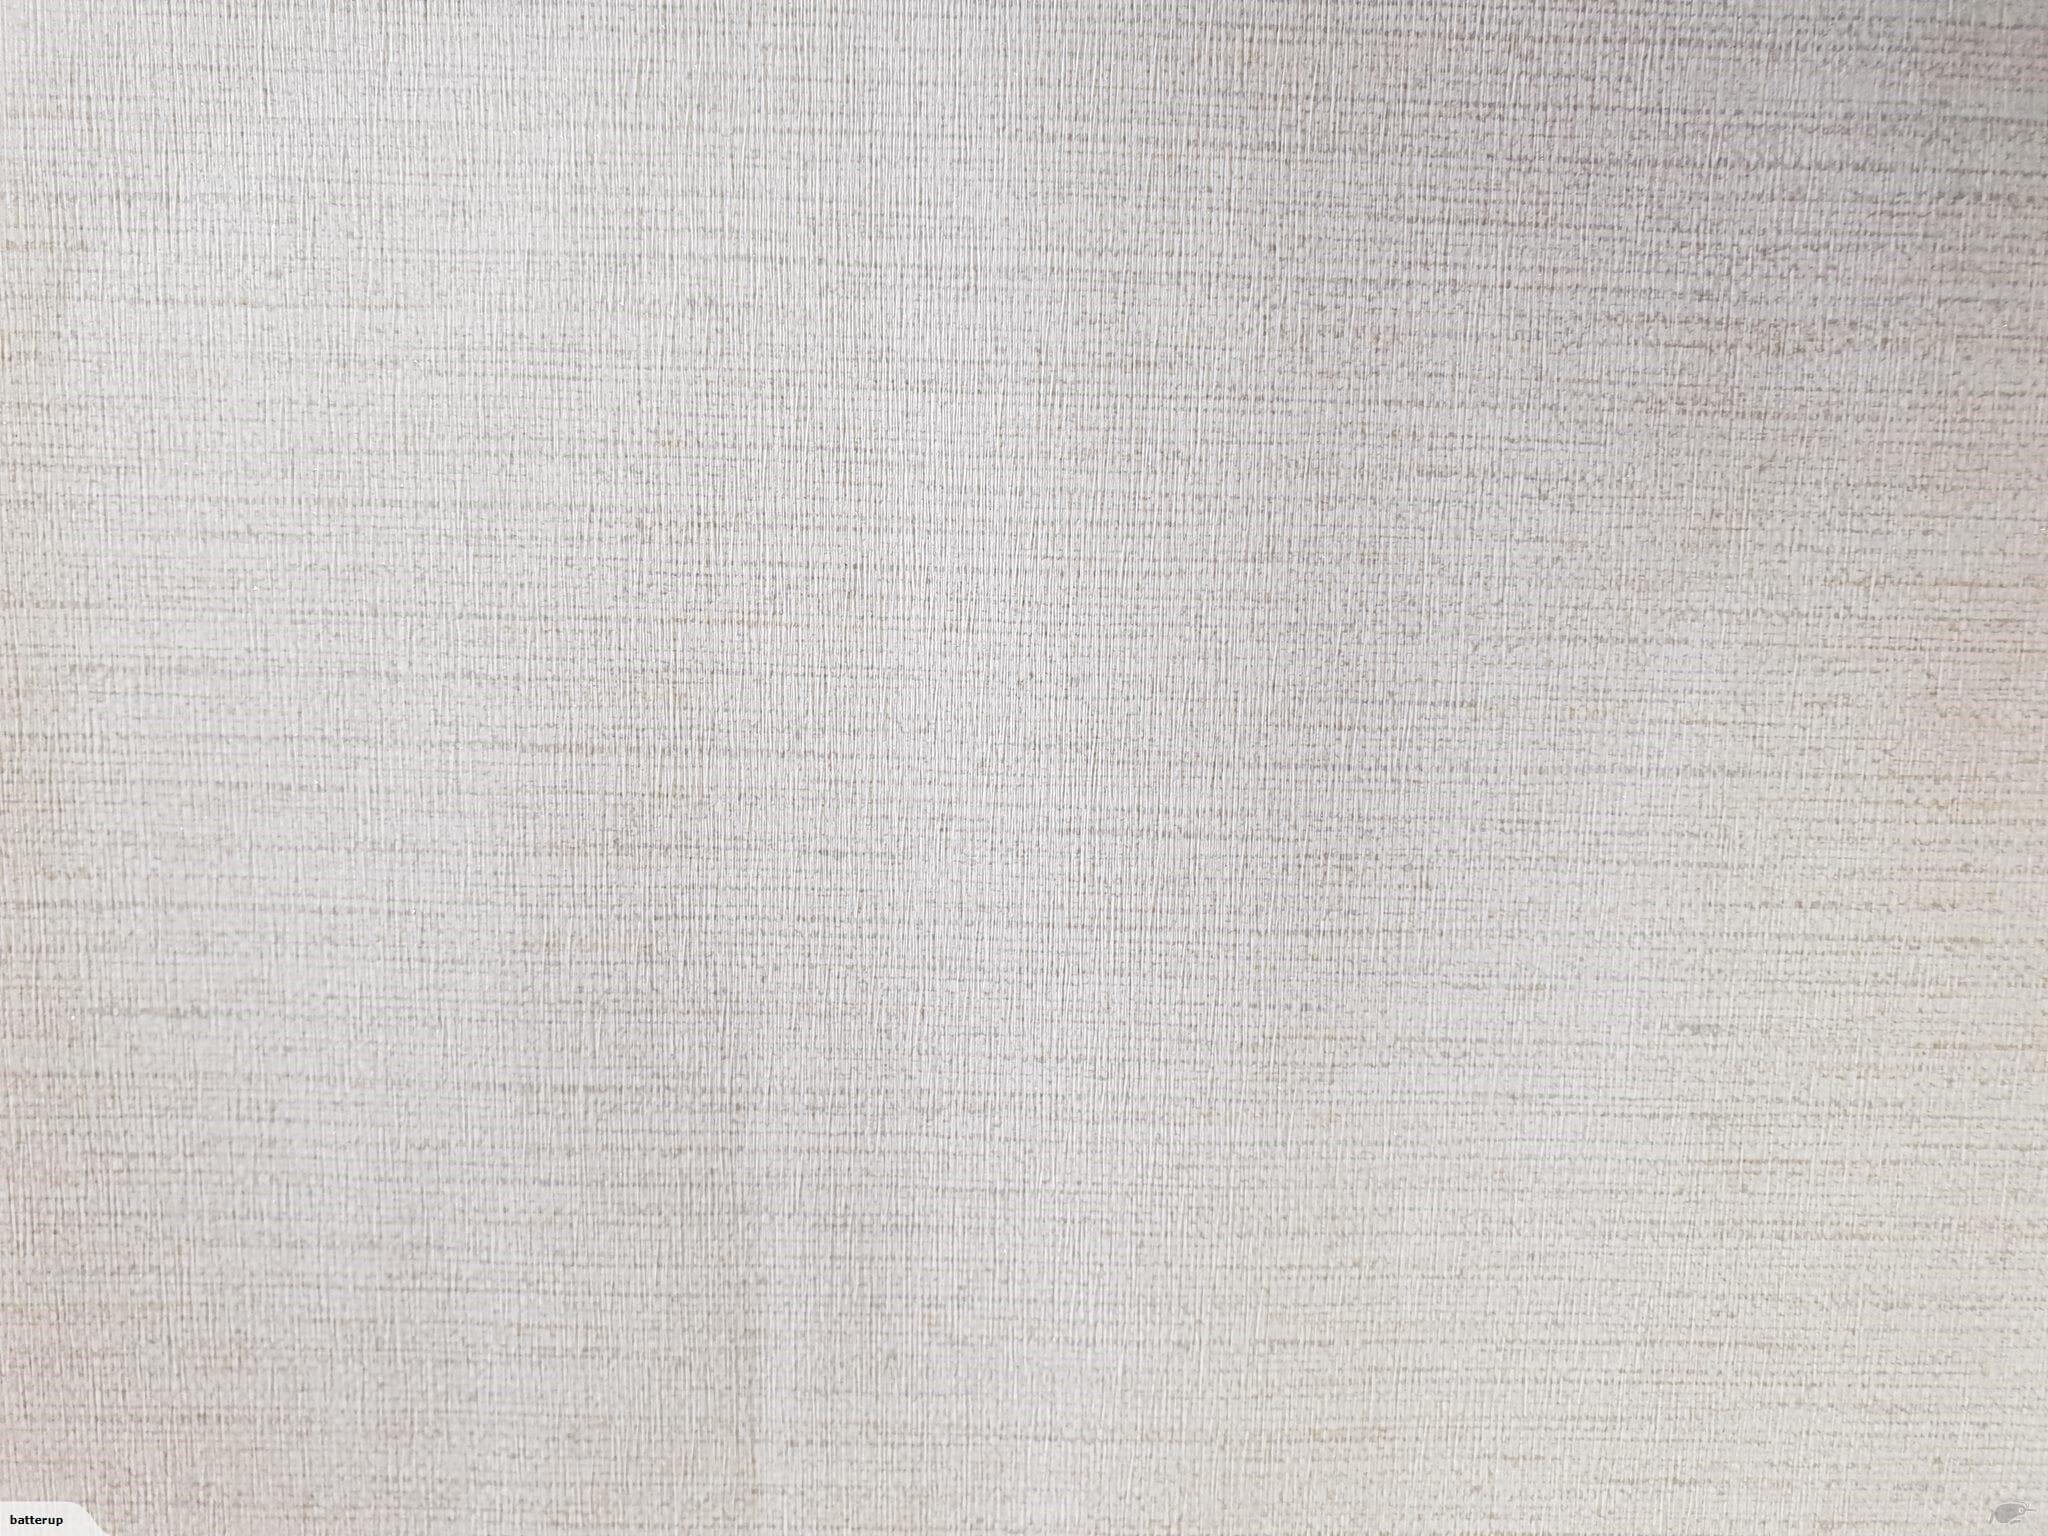 Quality Vinyl Unpasted Plain Weave Pattern In Light Grey